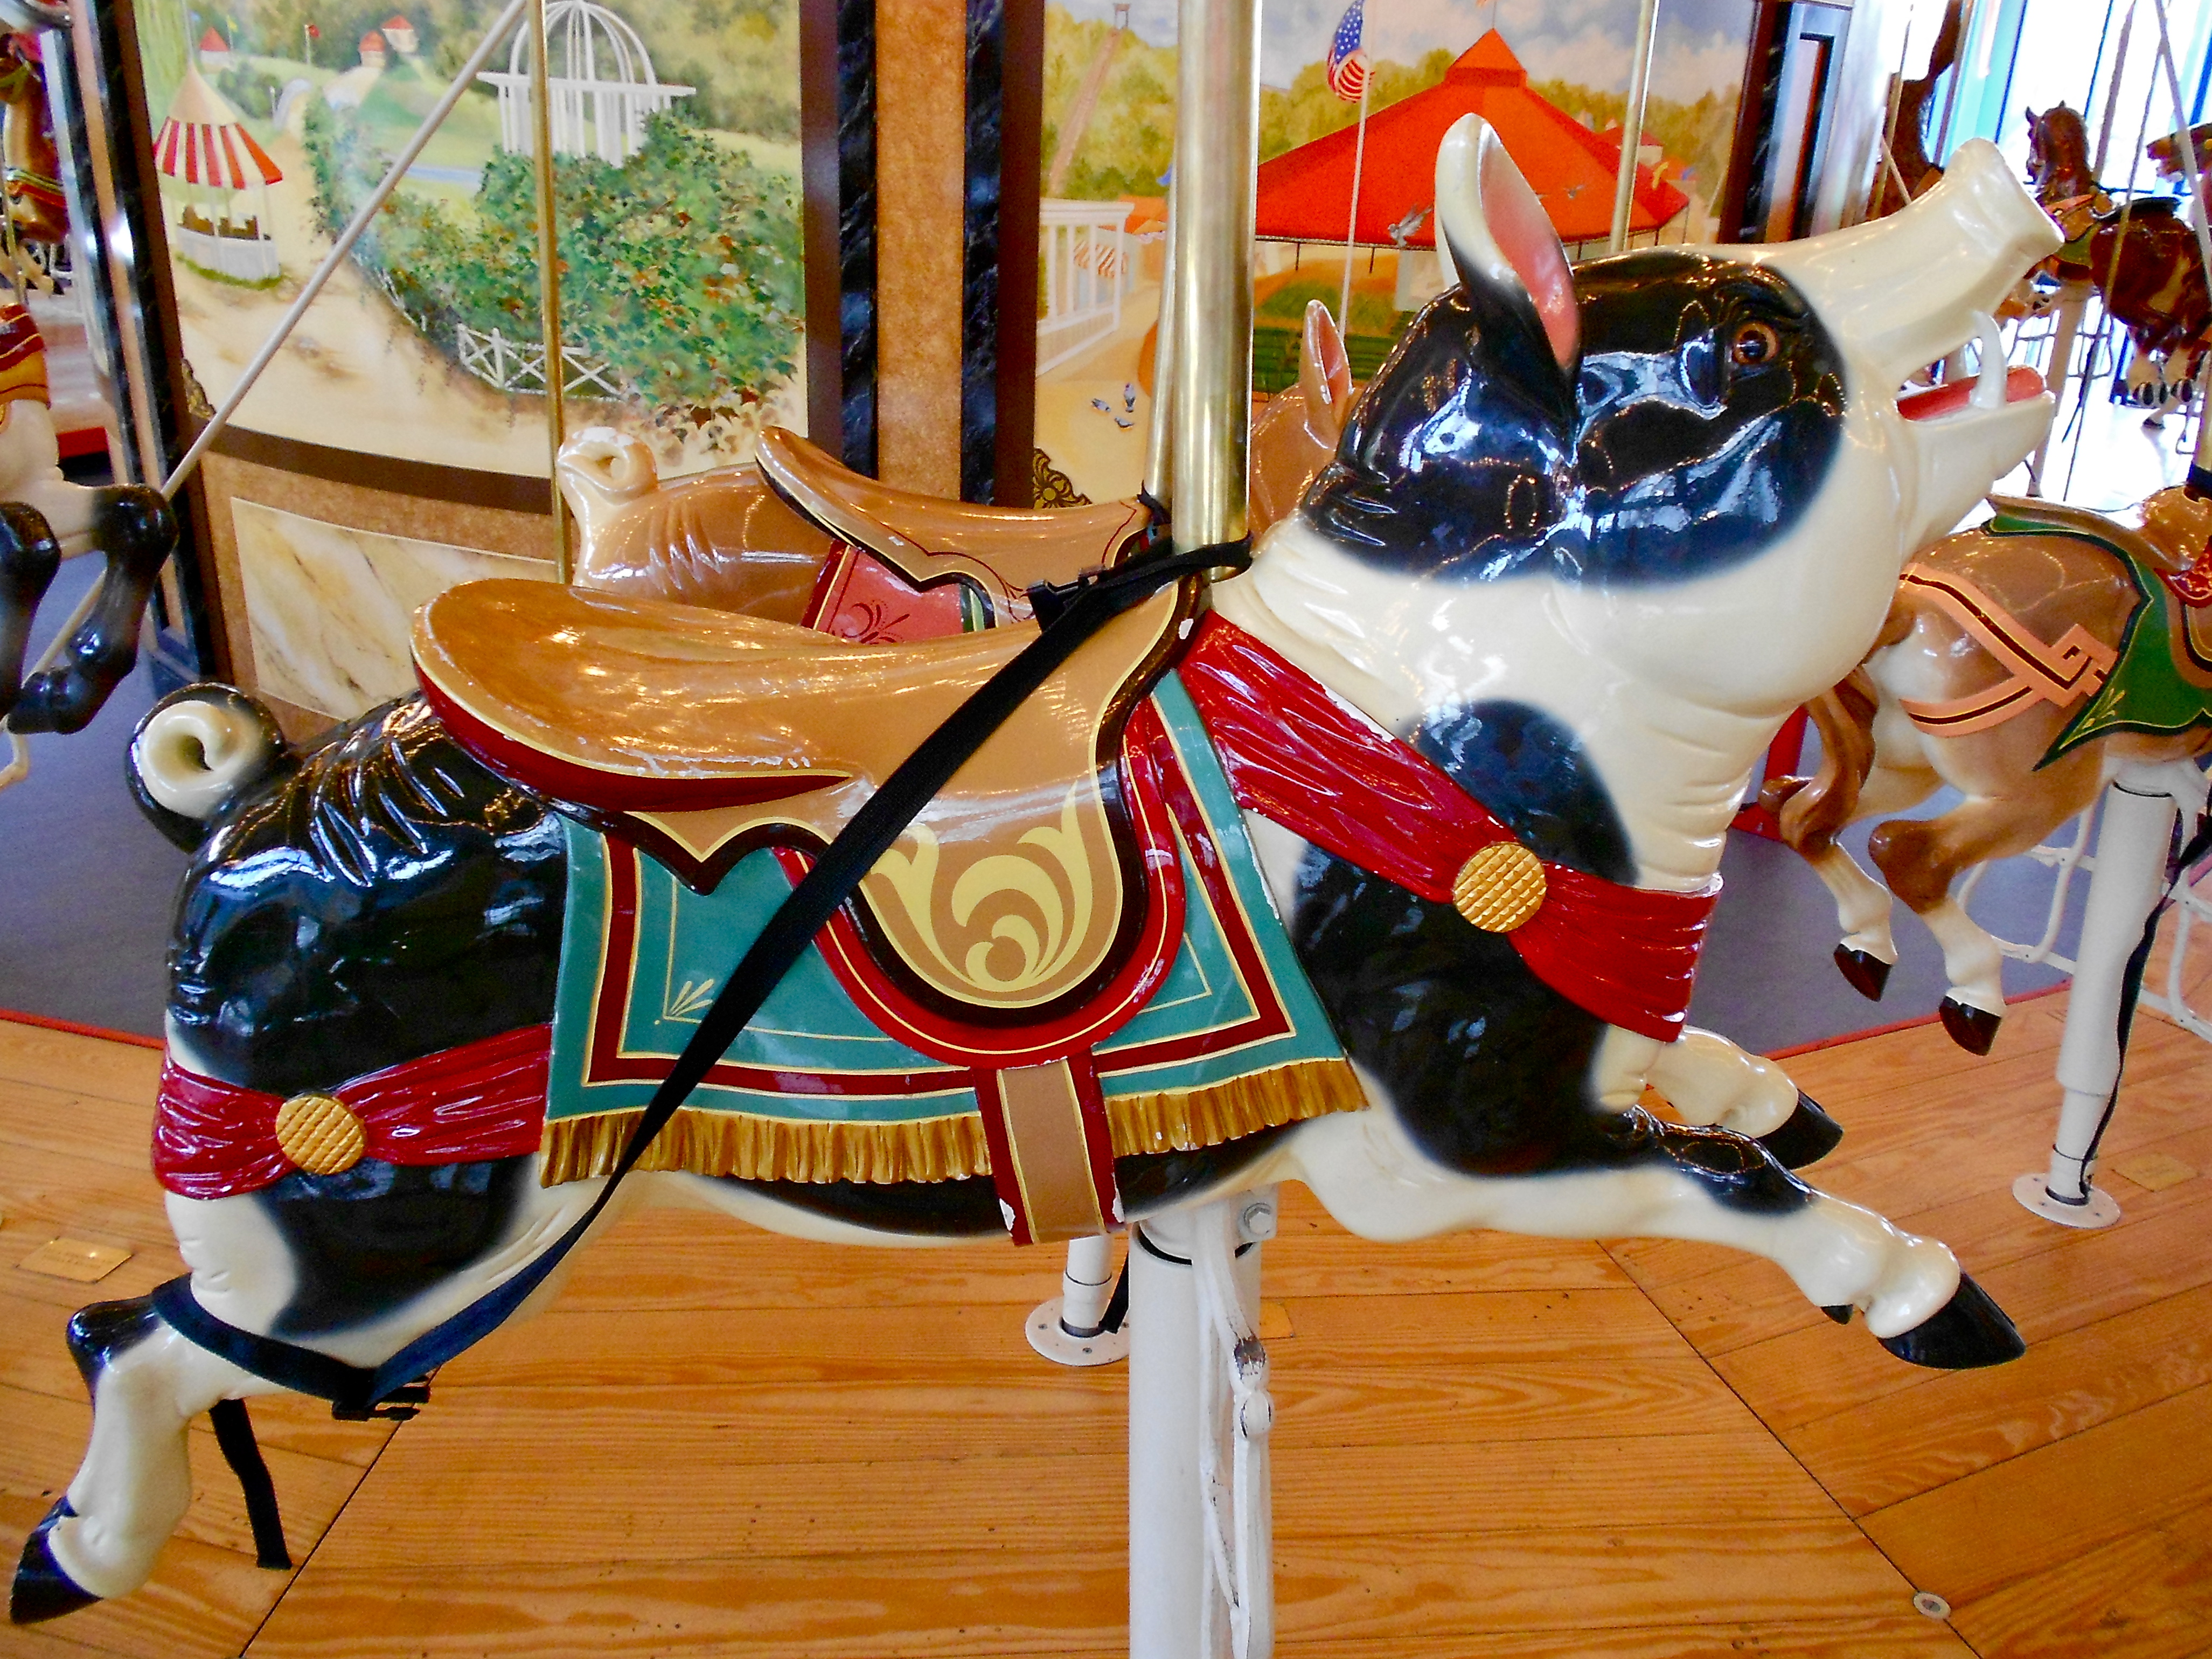 National carousel association denver zoo carousel african wild dog - Pig Figure On The Dentzel Carousel At Please Touch Museum In Philadelphia Carousels Pinterest Carousel Horses Family Trees And Doll Houses